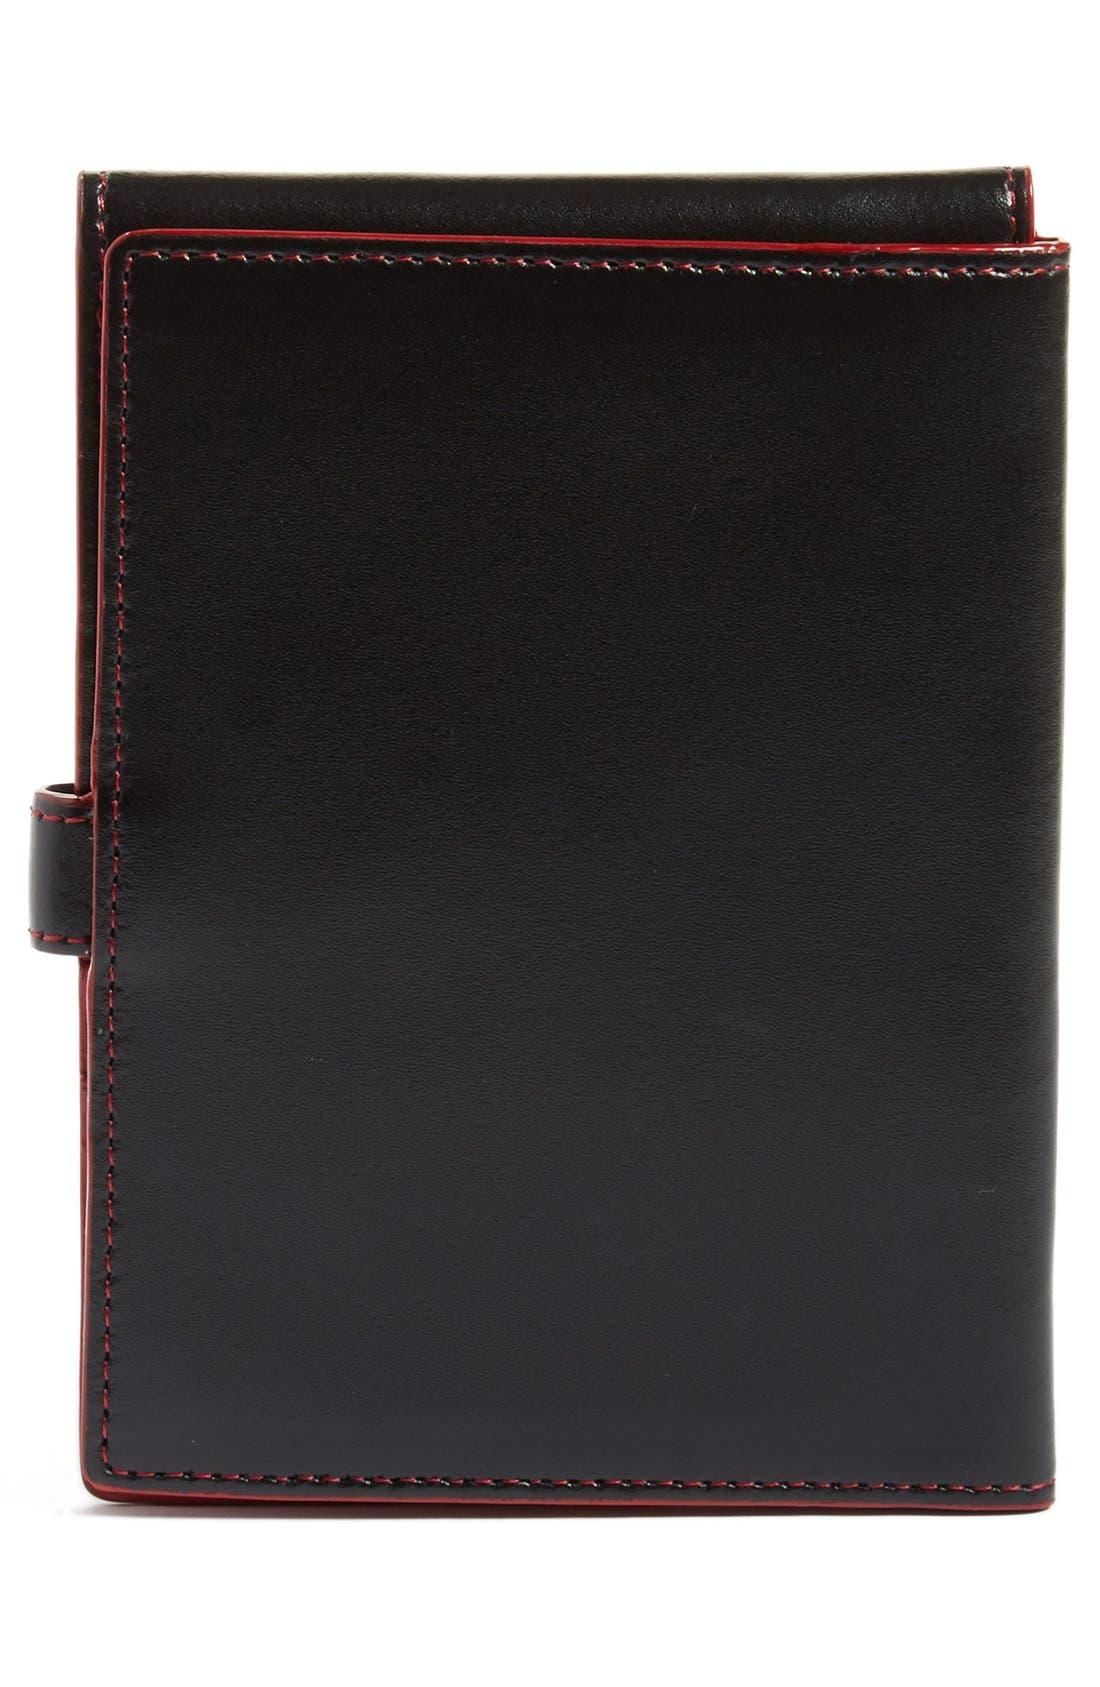 Audrey RFID Leather Passport Wallet,                             Alternate thumbnail 2, color,                             BLACK